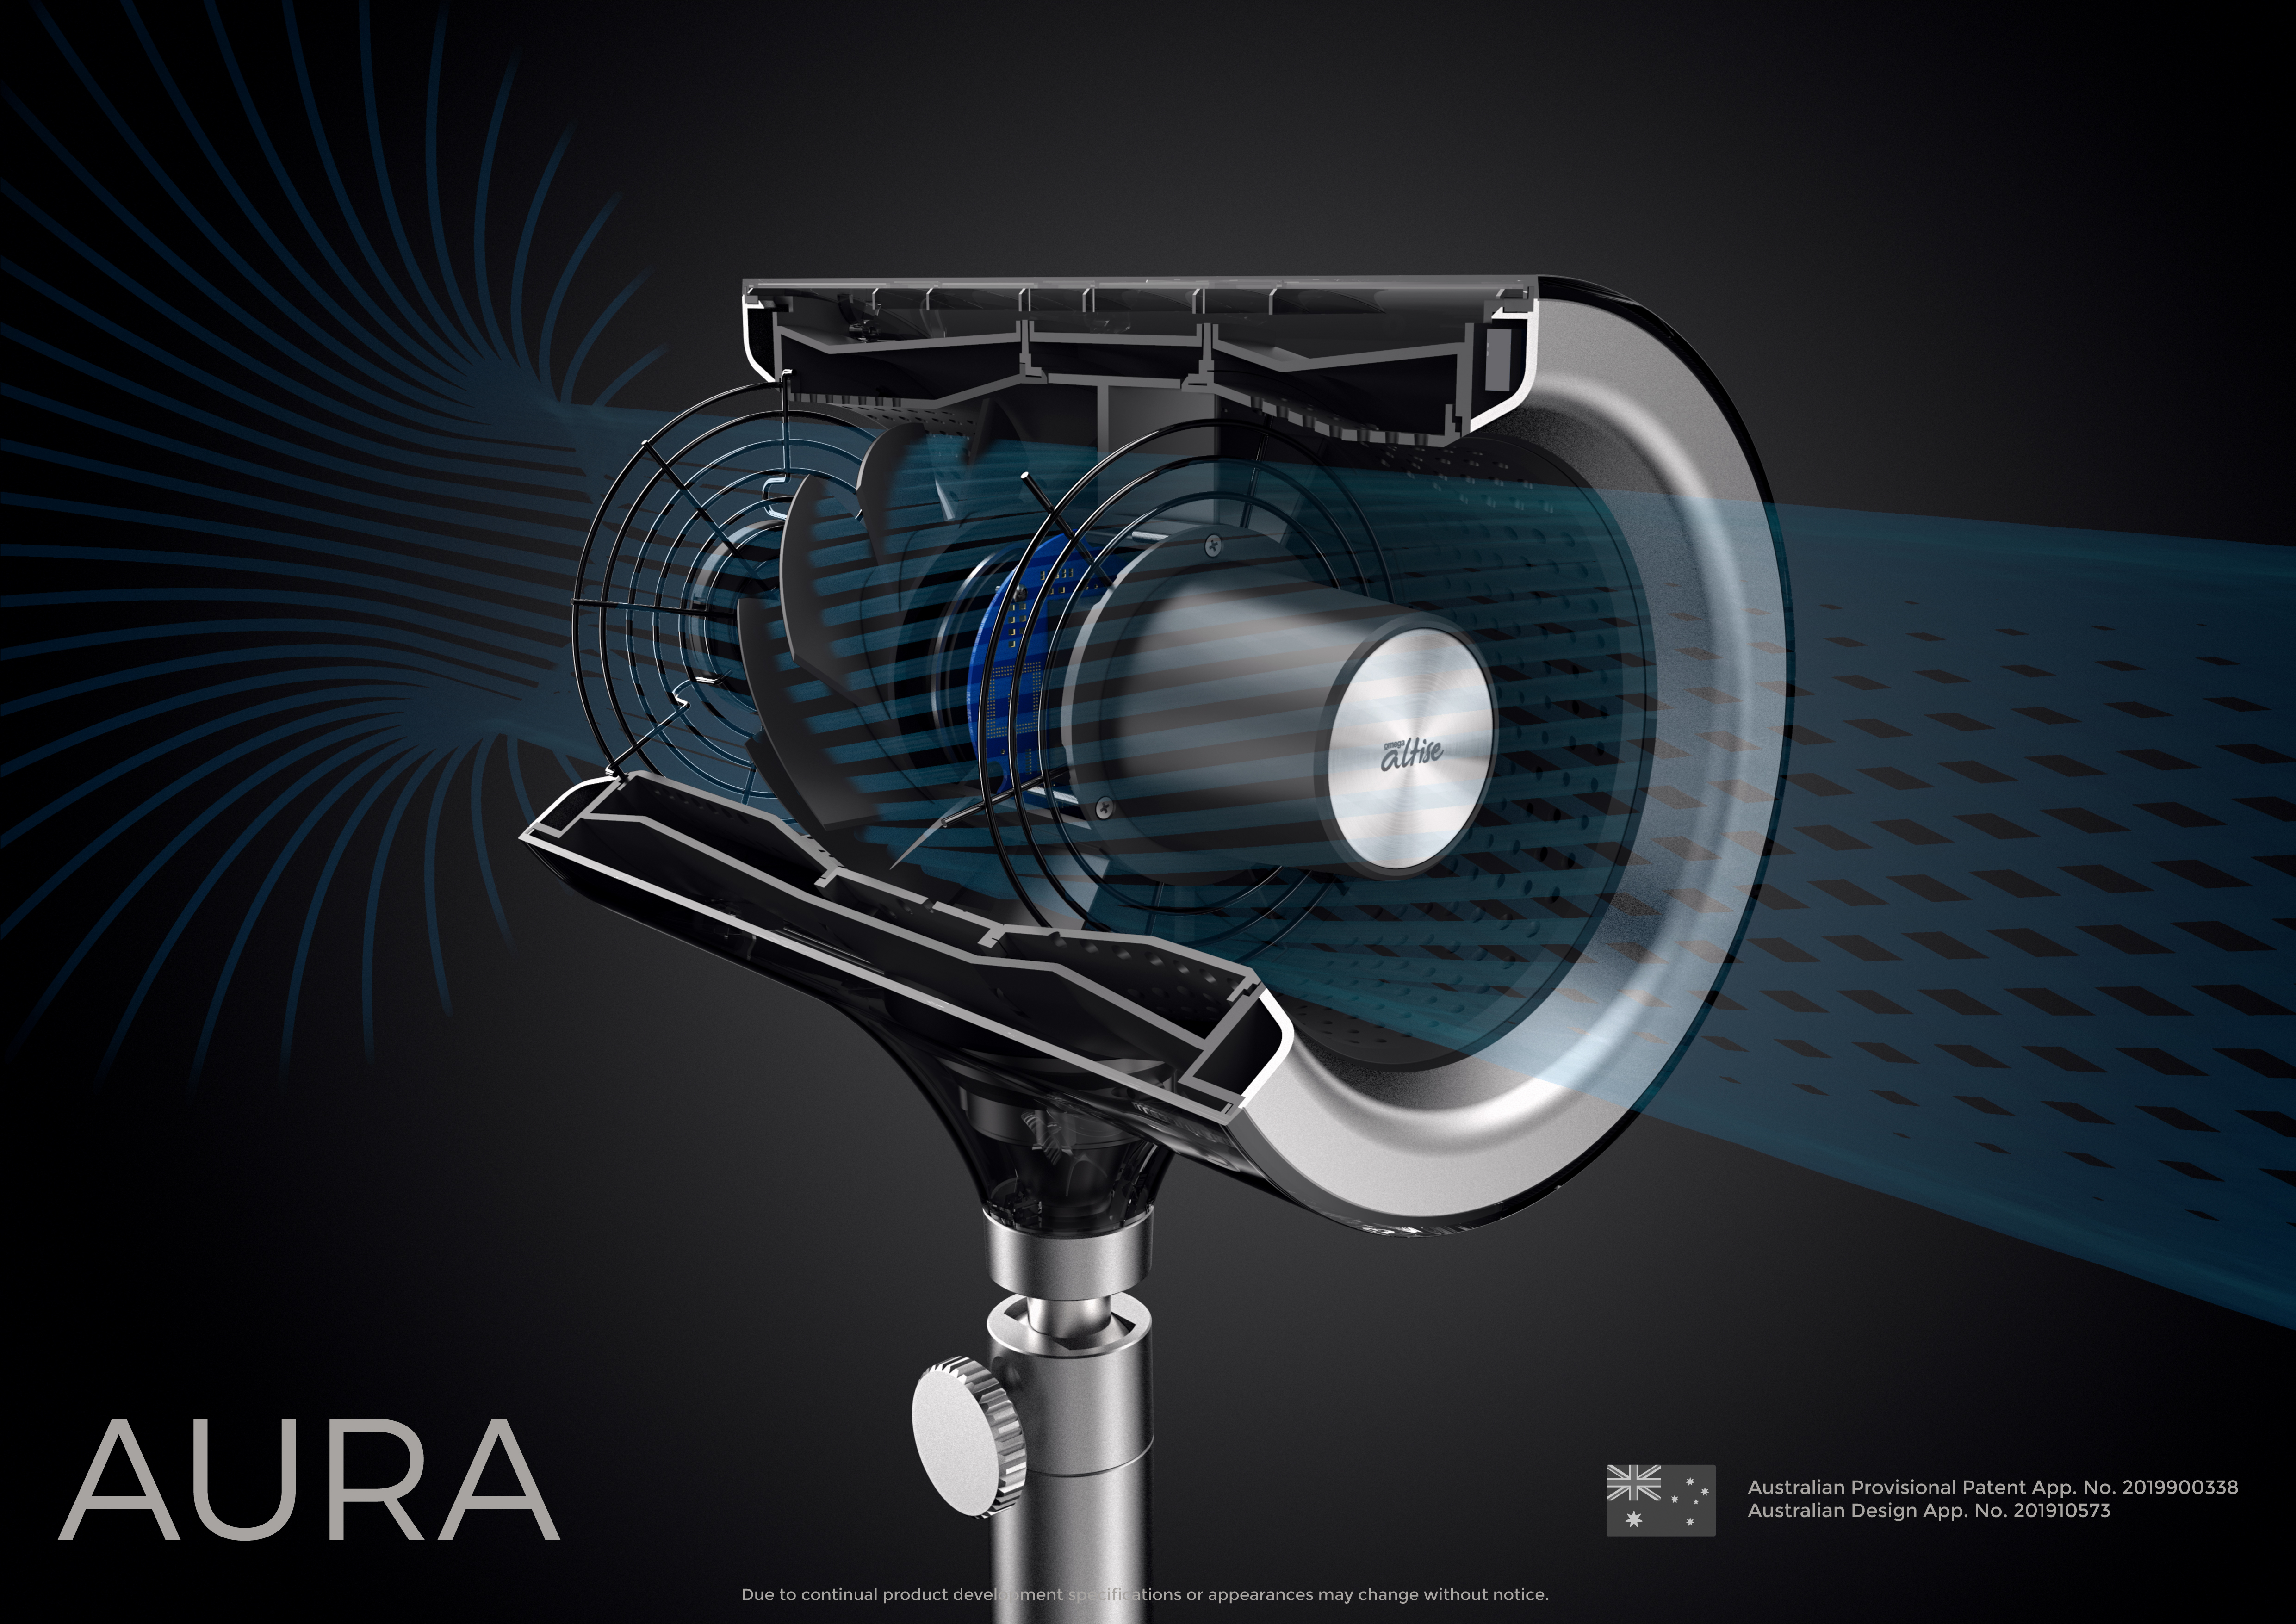 Omega Altise Product Aura Pedestal Fan 12.5cm - Blue(OP125B)